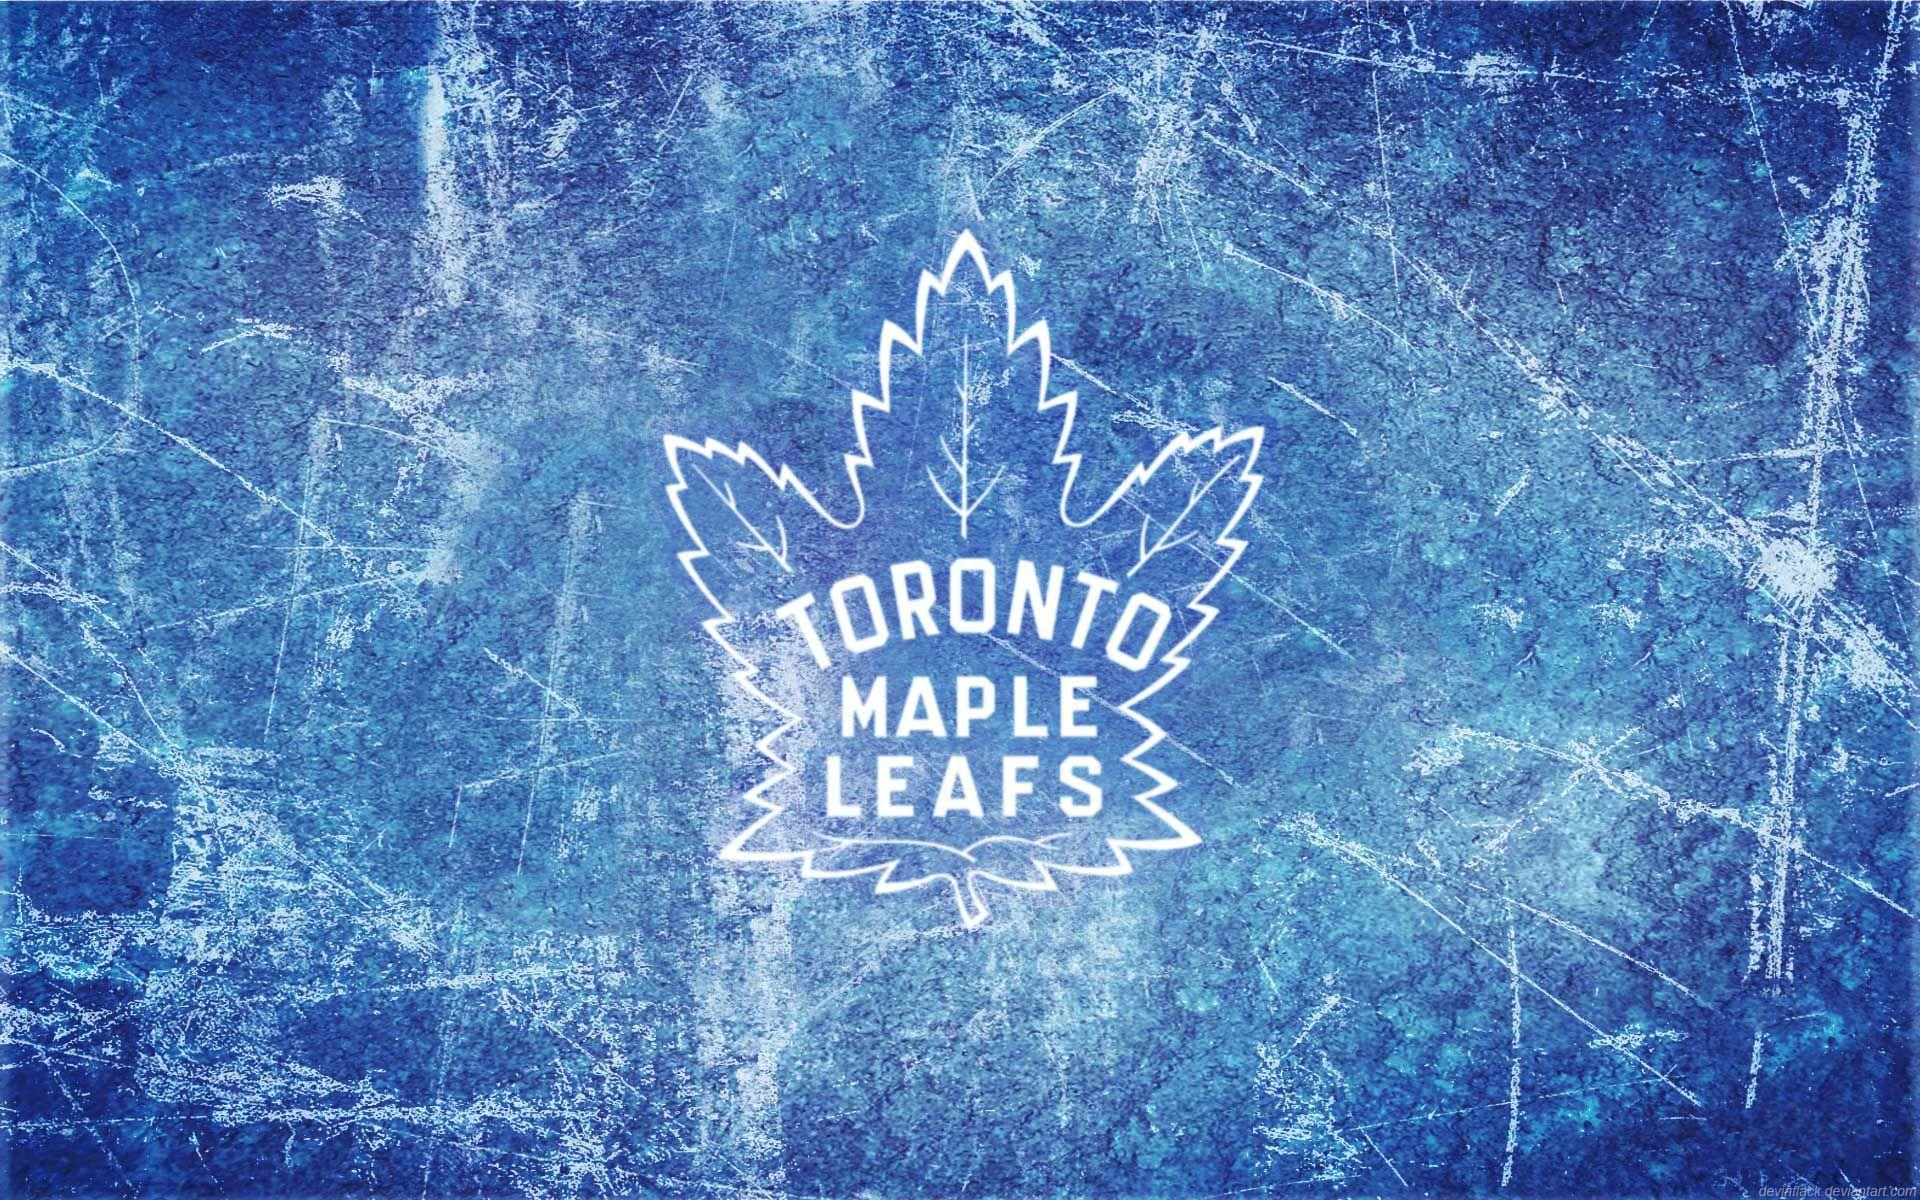 Toronto Maple Leafs Wallpapers Toronto Maple Leafs Wallpaper Maple Leafs Wallpaper Toronto Maple Leafs Logo